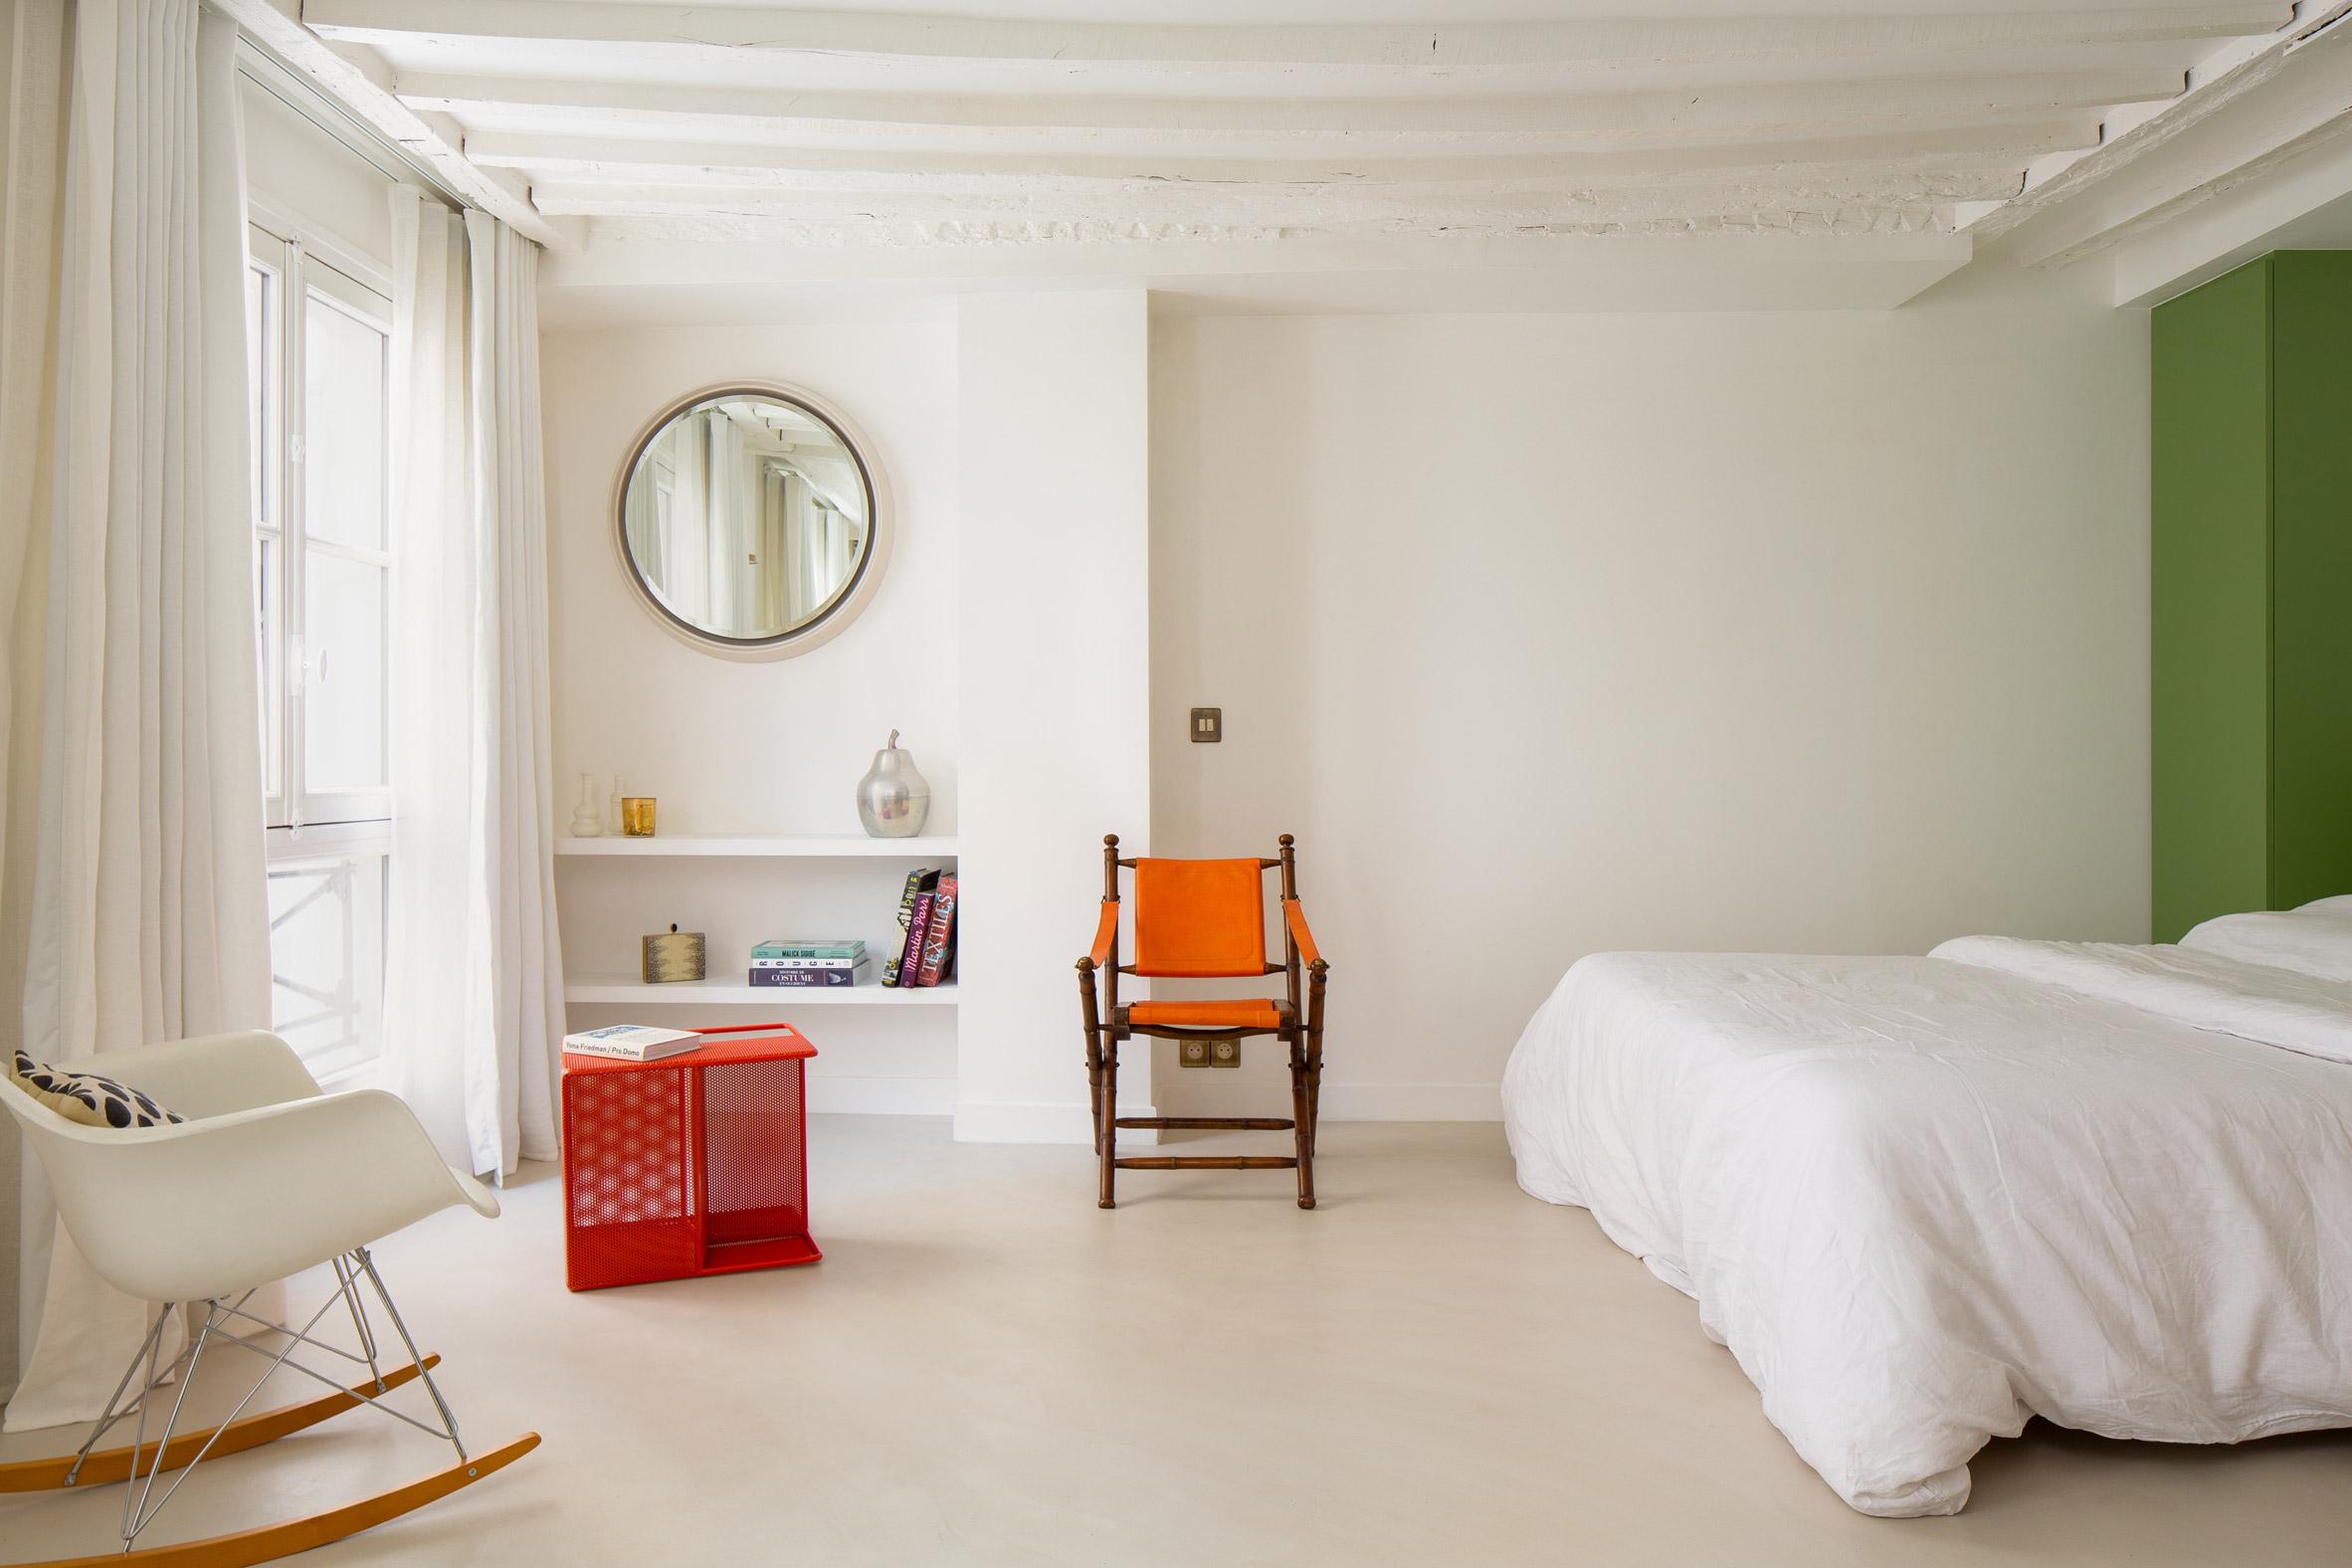 Beams in the ceiling were left exposed by Pierre-Louis Gerlier Architecte